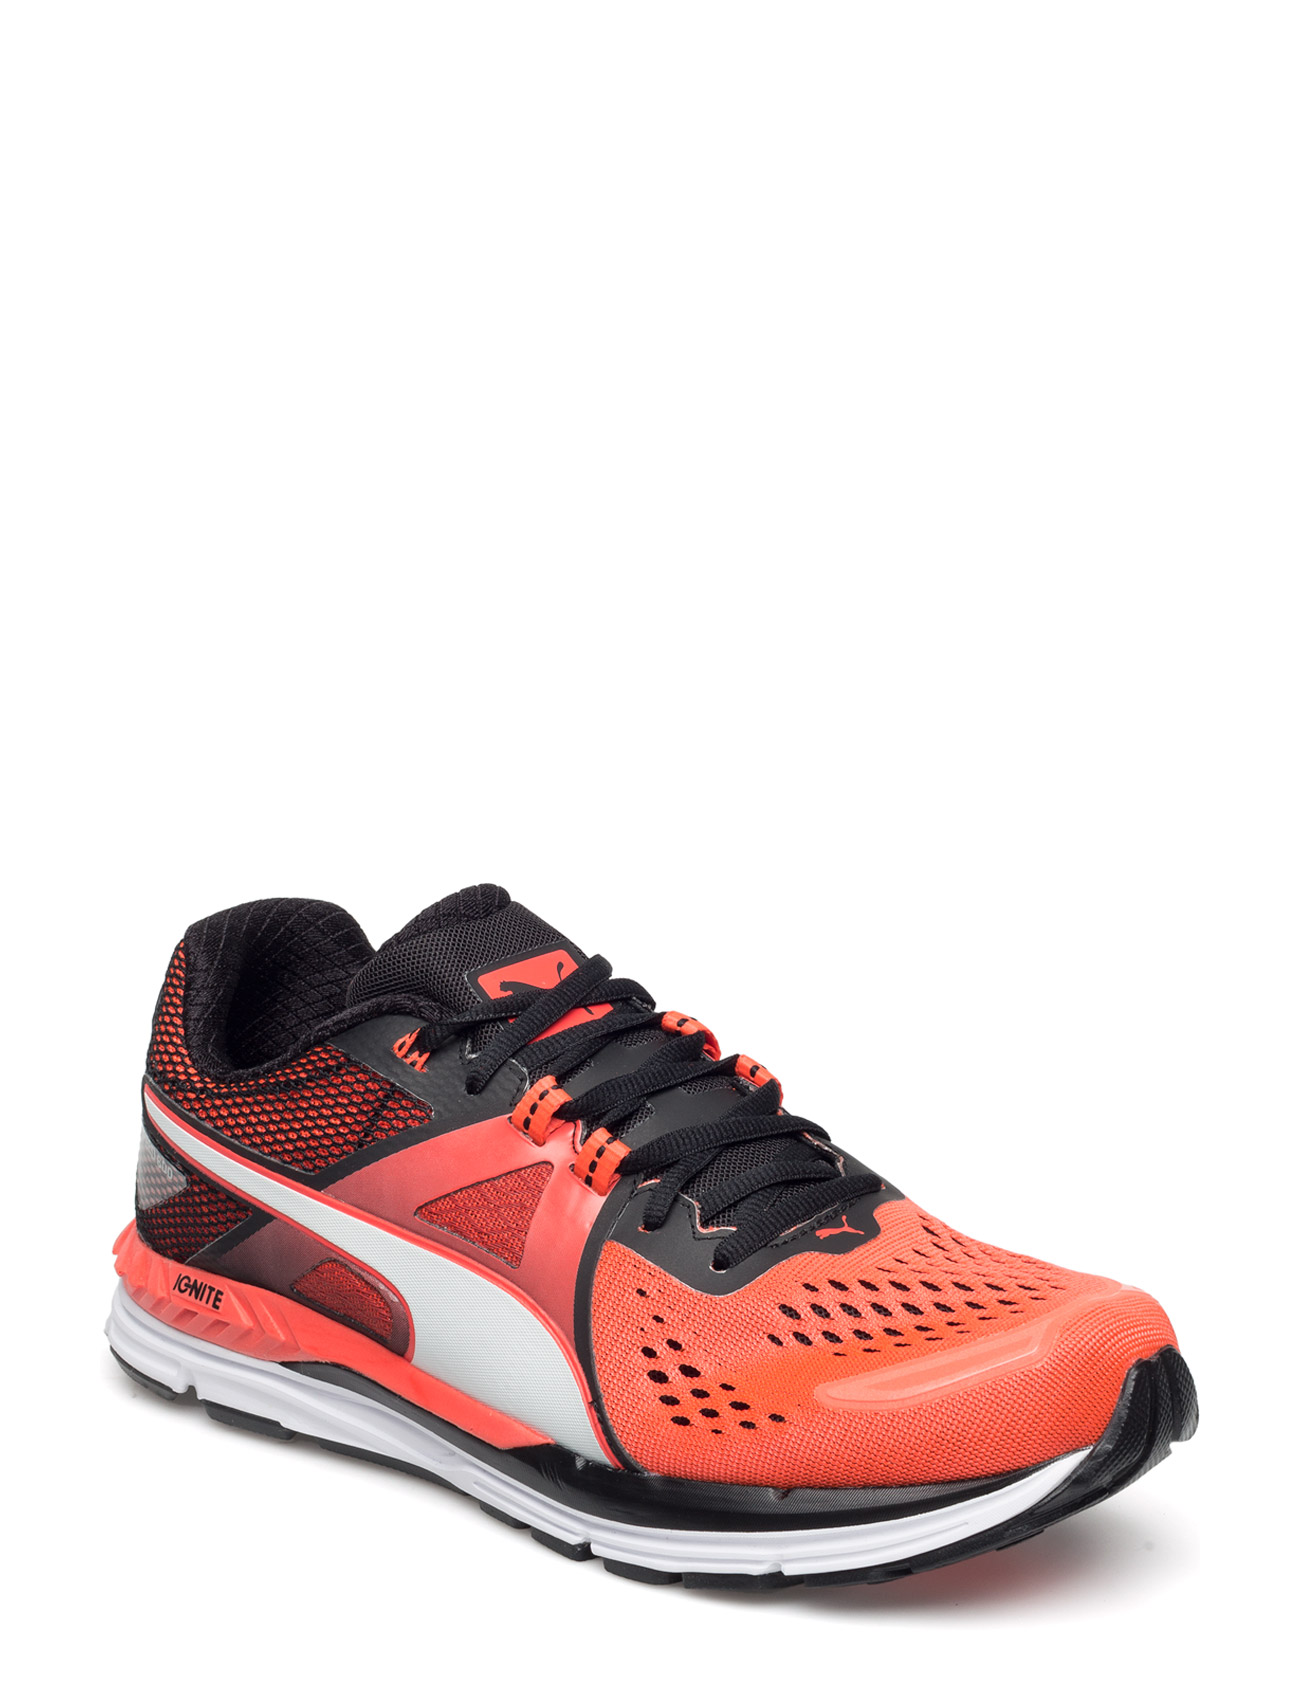 Speed 600 Ignite PUMA SPORT Sports sko til Herrer i